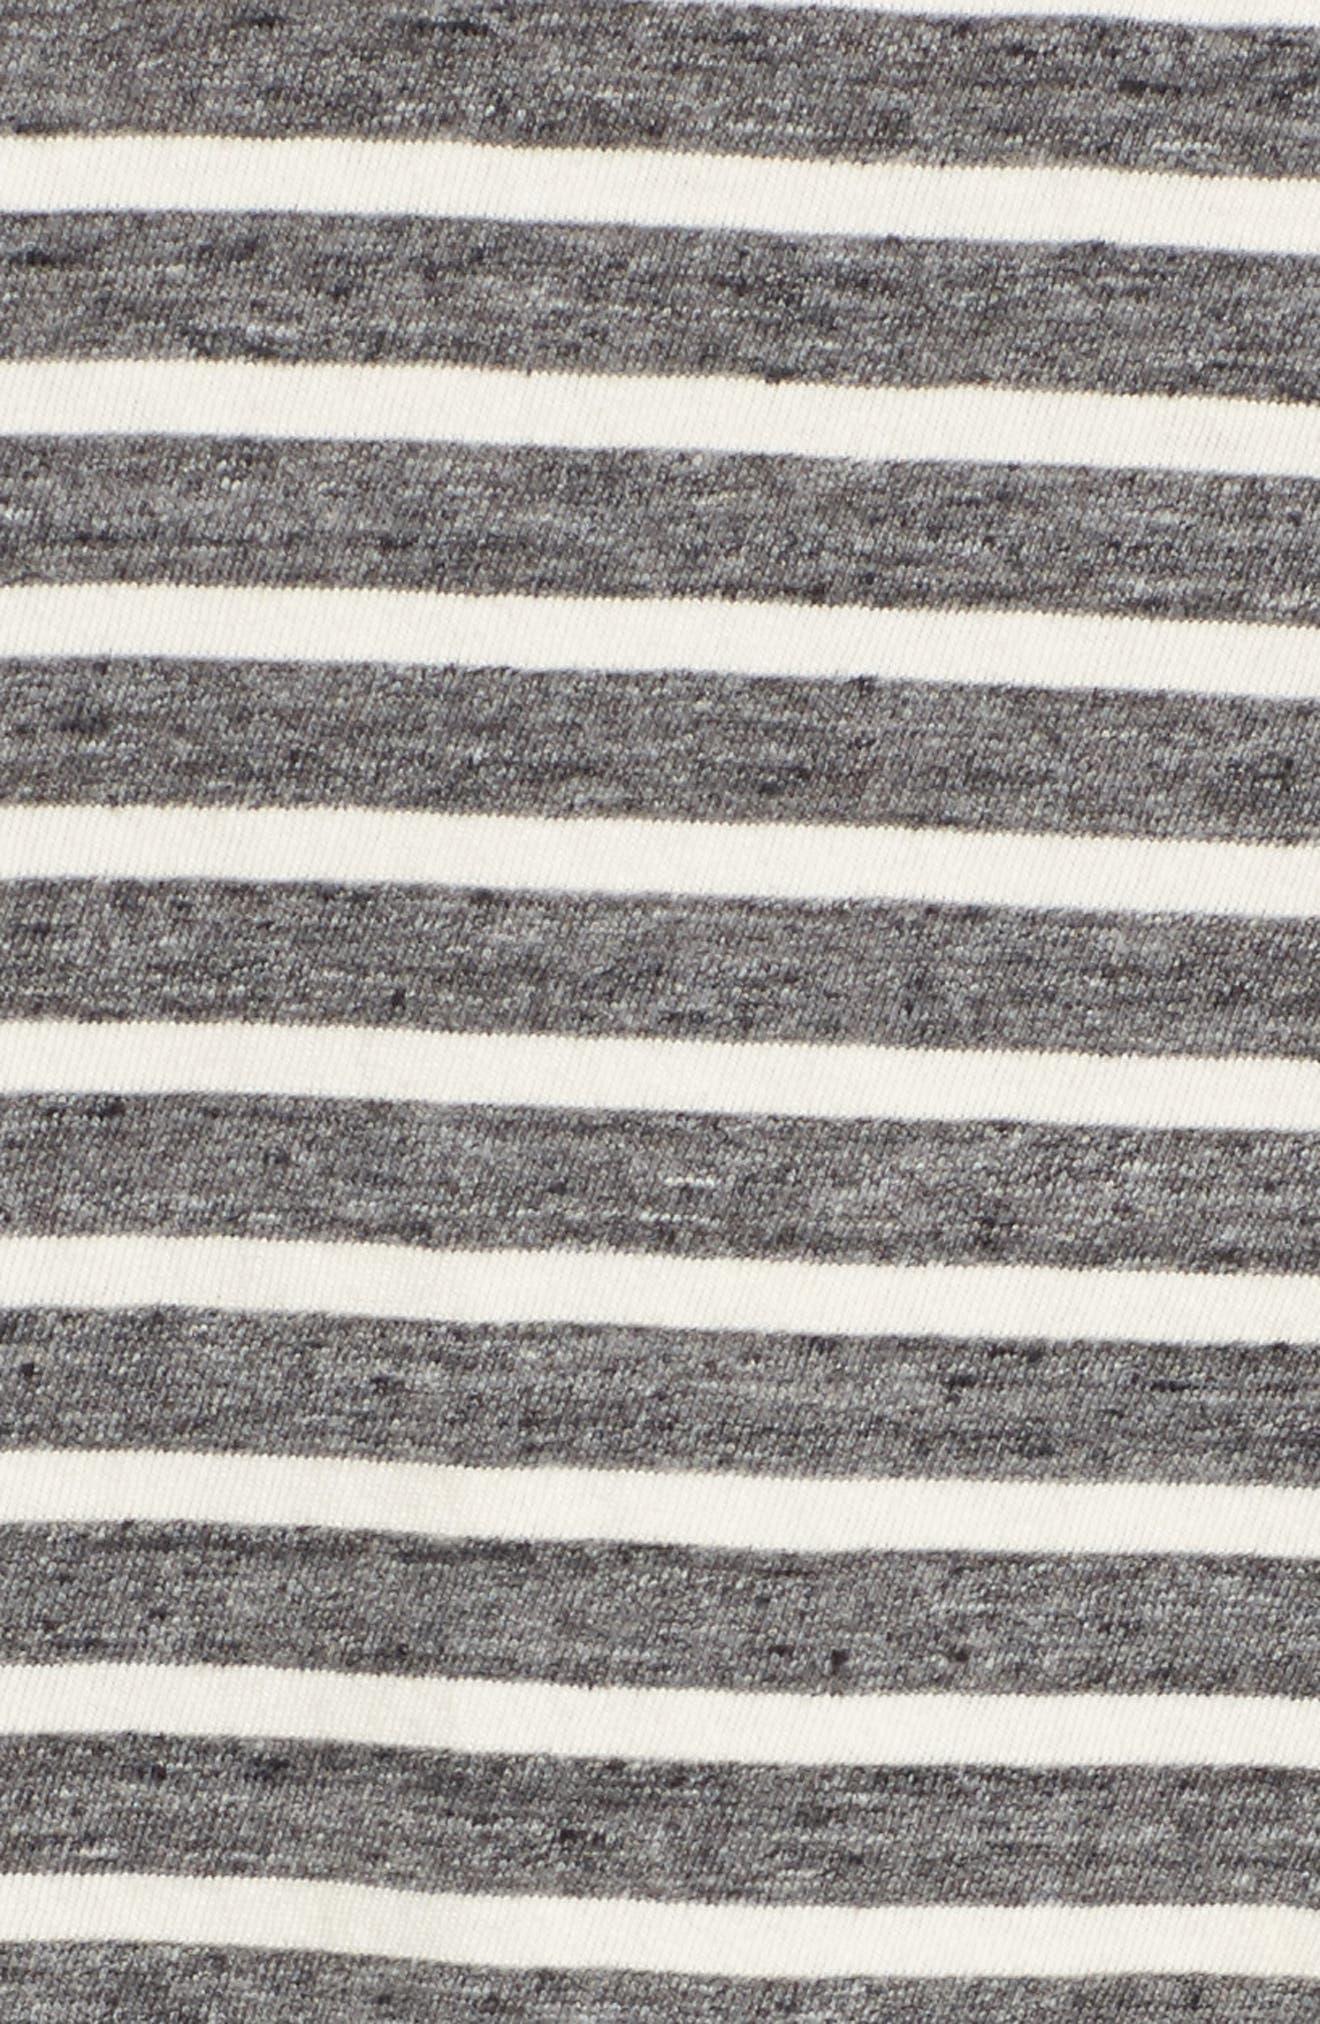 Stripe Slouchy Tee,                             Alternate thumbnail 5, color,                             022